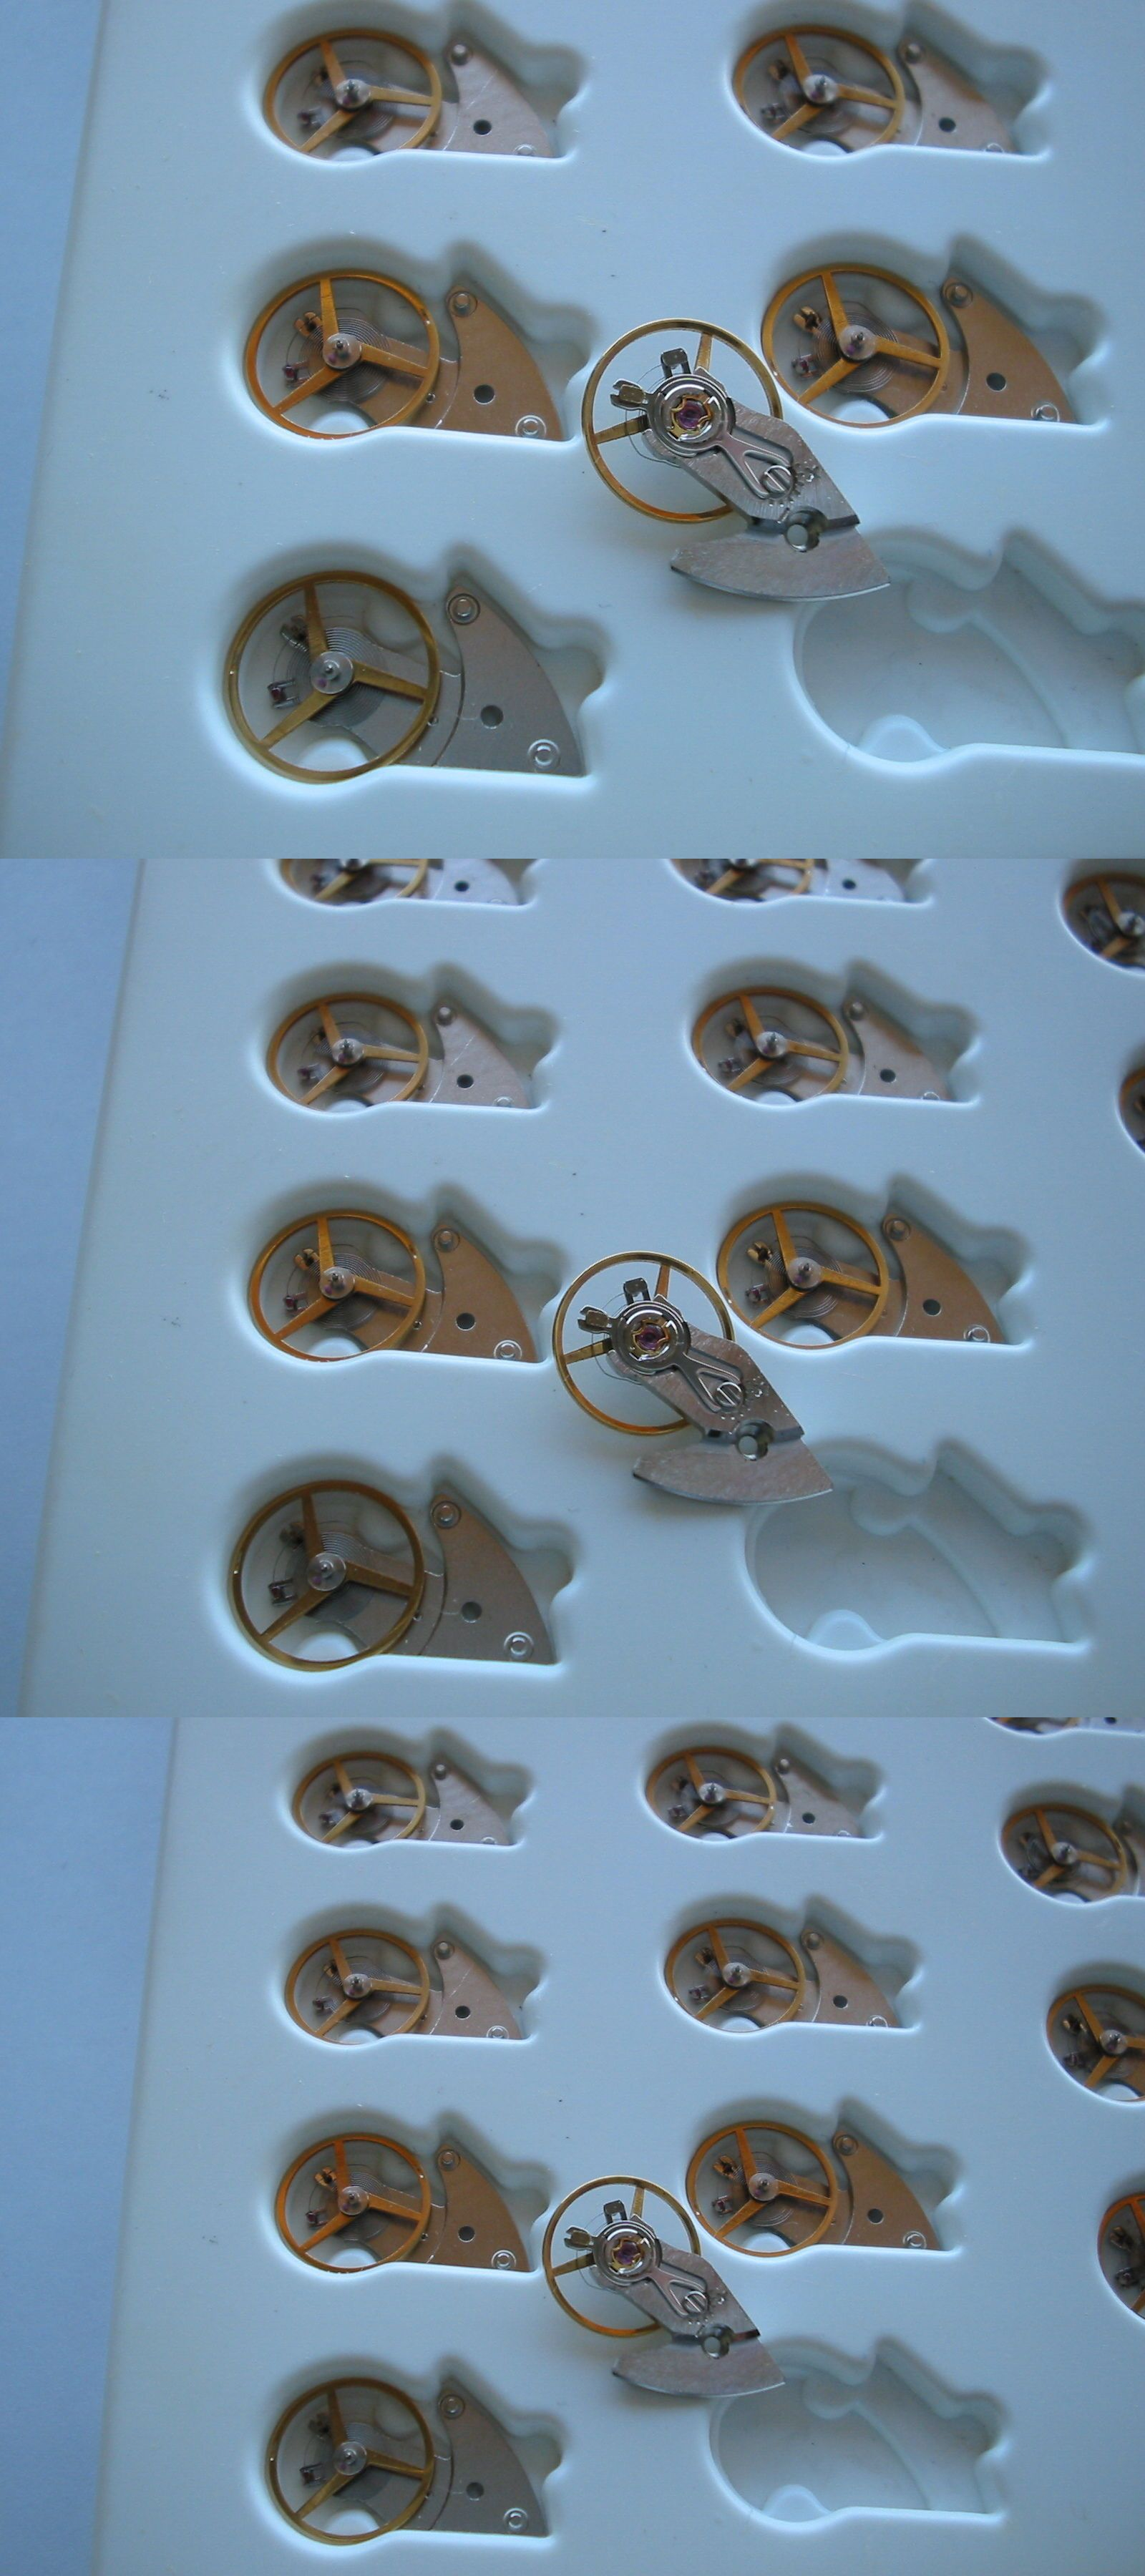 Movements 57720: Eta 2892-2, 2892A2, L629.1 Balance Wheel With ...